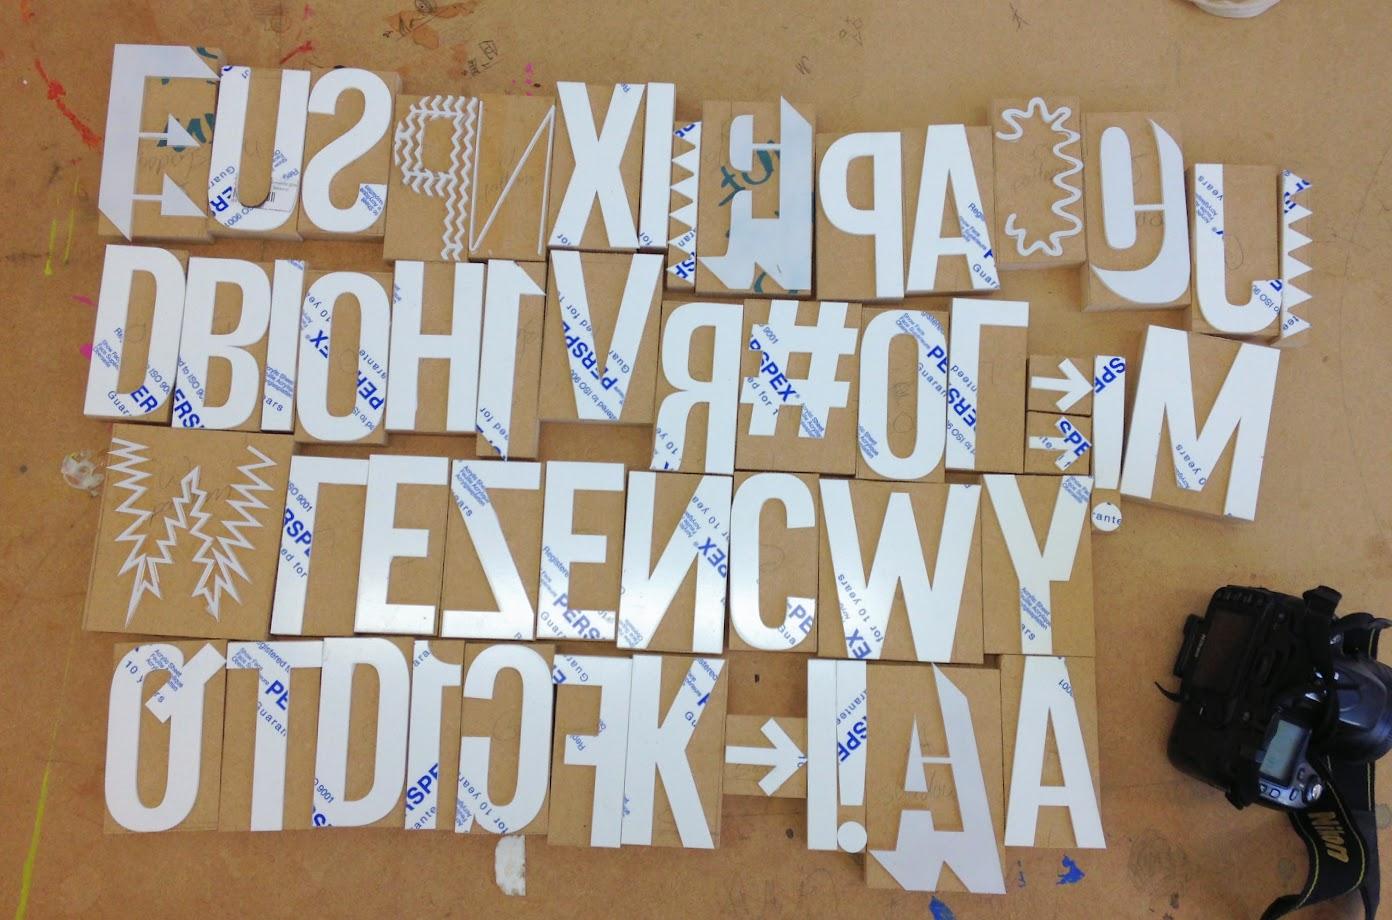 Adopting a Digital Typeface for Letterpress Printing